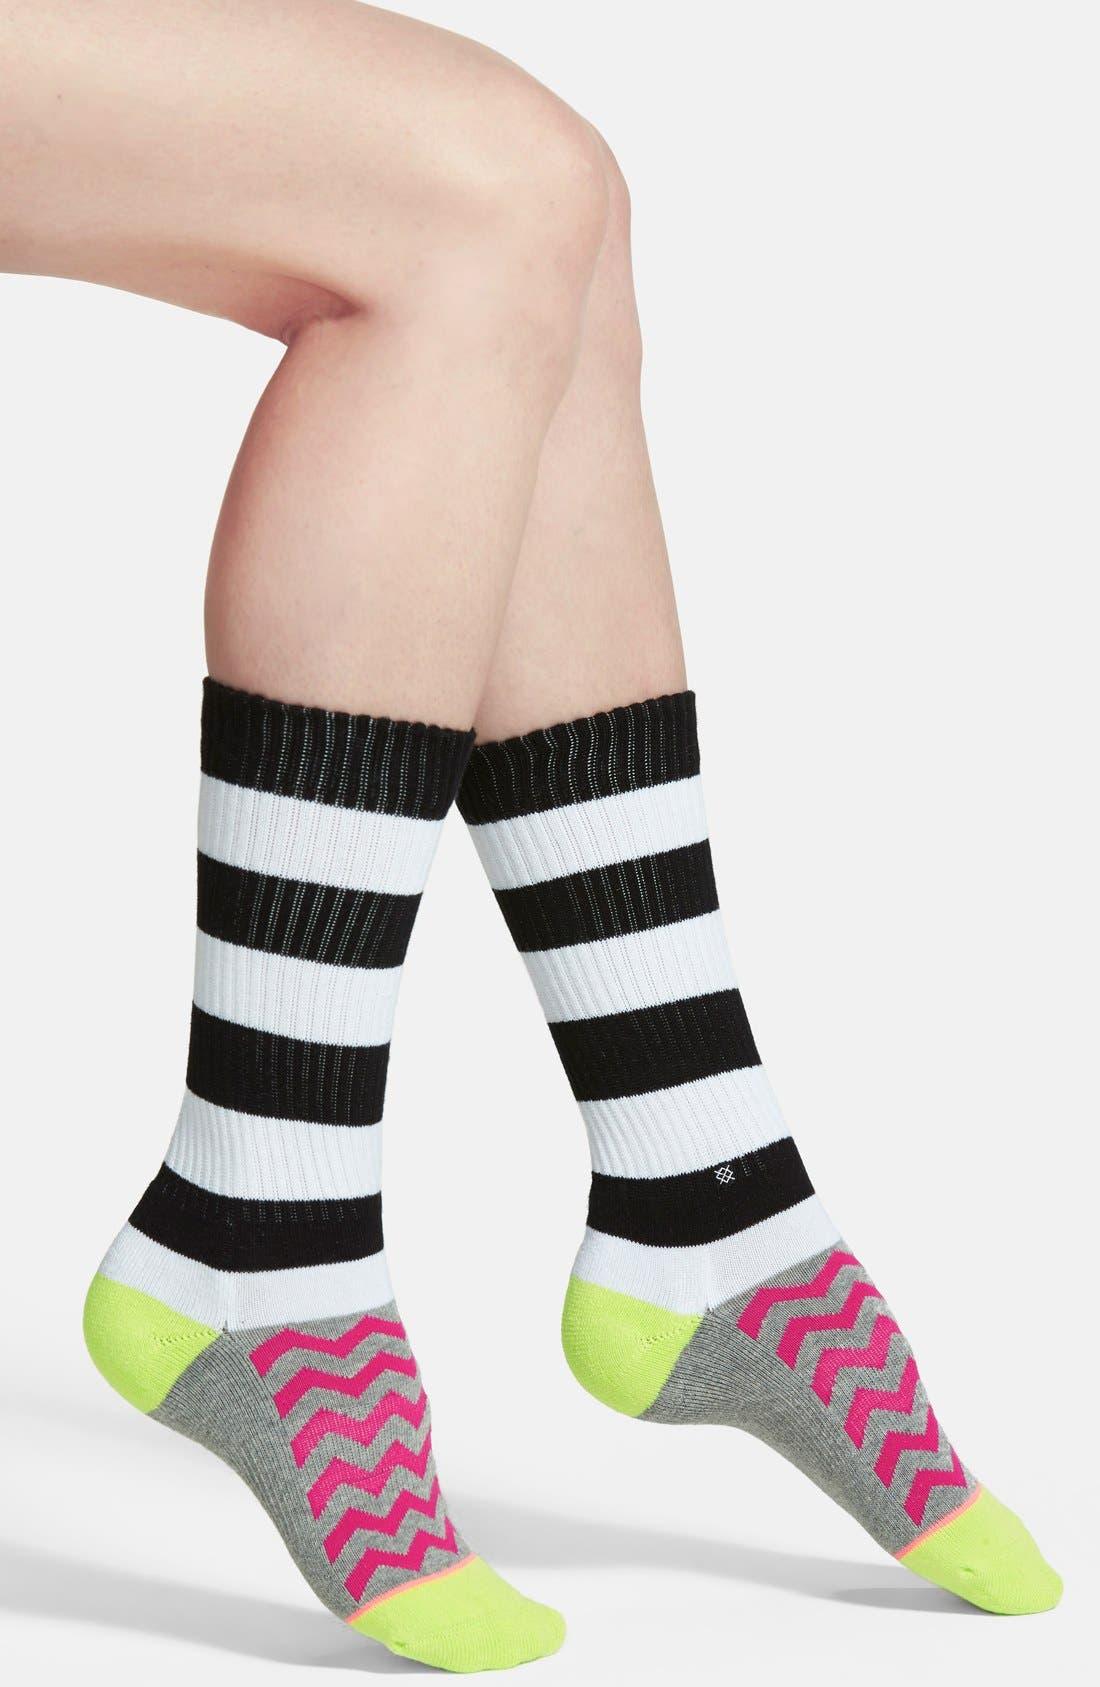 Alternate Image 1 Selected - Stance 'Evermore' Stripe & Chevron Crew Socks